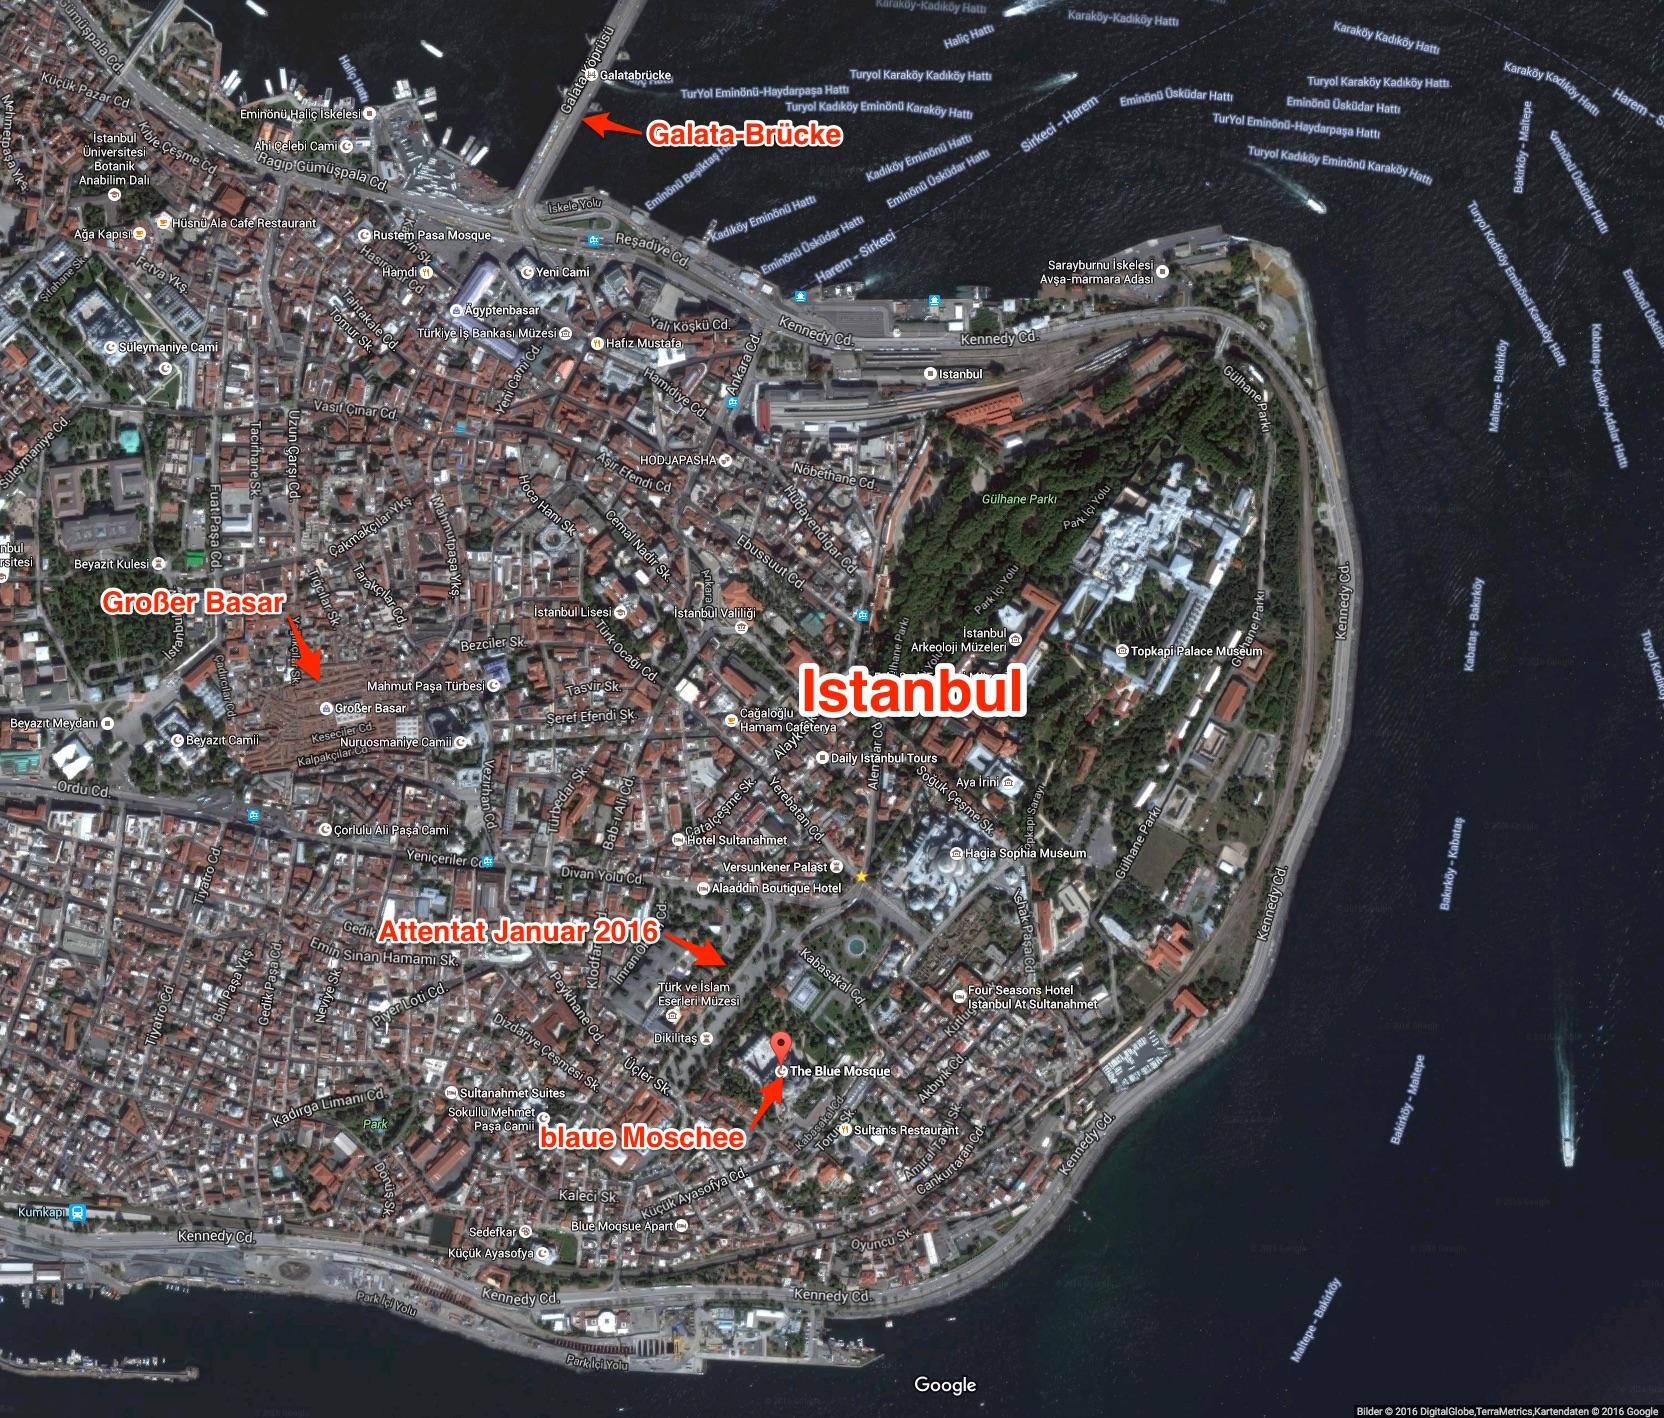 Team Propellerheads - AOR2016 - Istanbul Blaue Moschee - Rosengarten